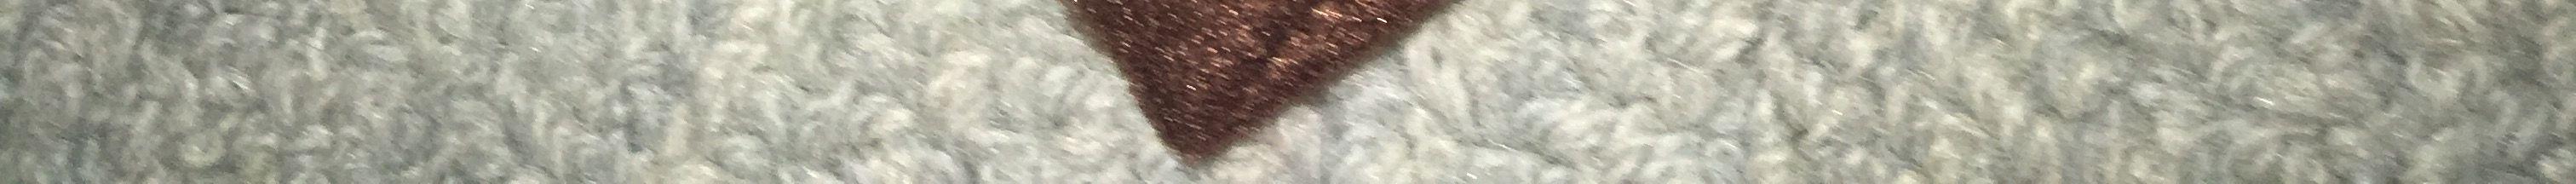 Fake Leather Slipper